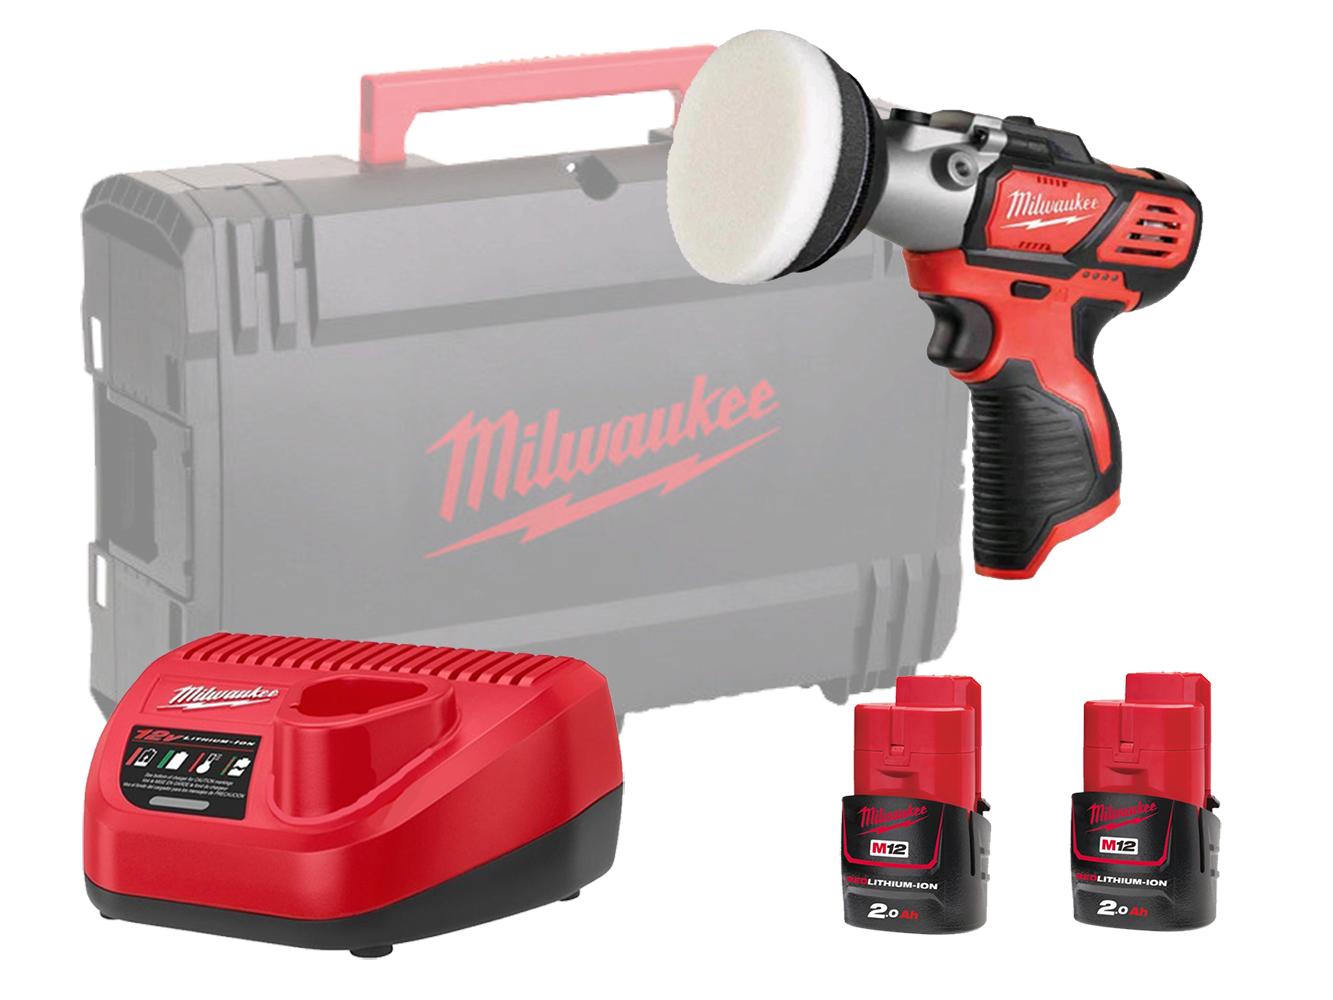 Milwaukee M12BPS 12V Polisher / Sander - Sub Compact - 2.0ah Pack